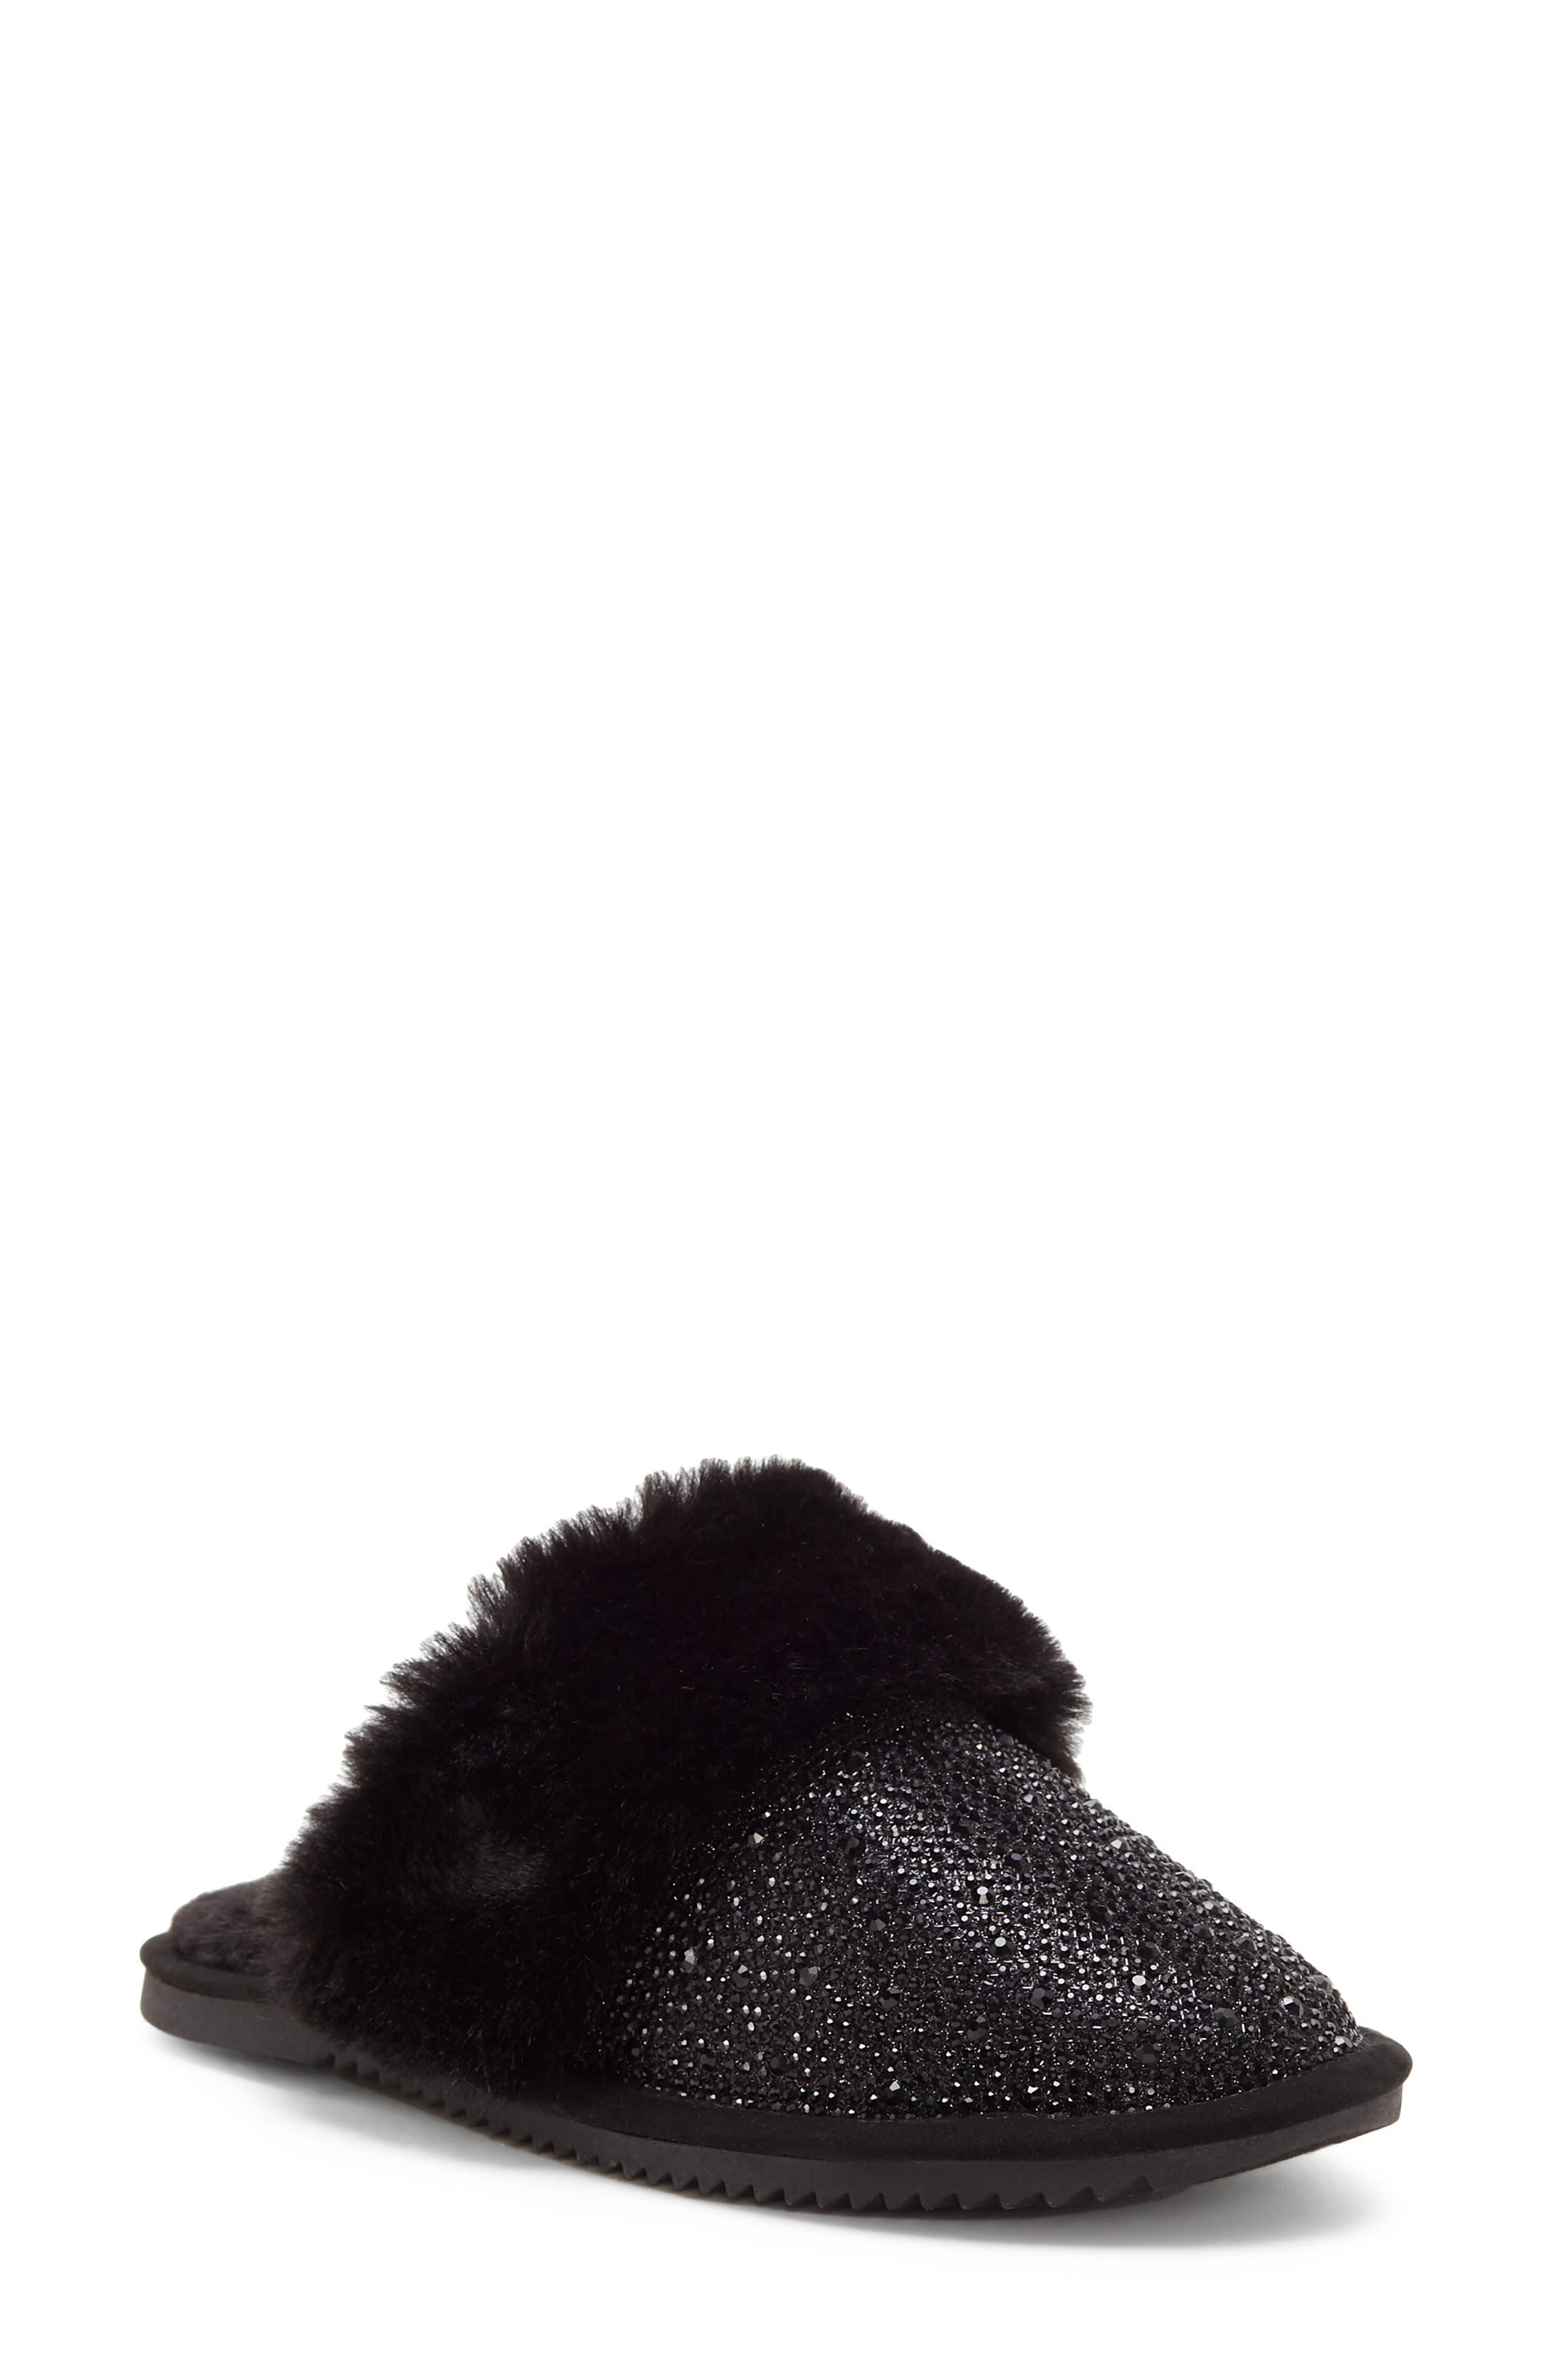 JESSICA SIMPSON Jessenia Slipper, Main, color, BLACK